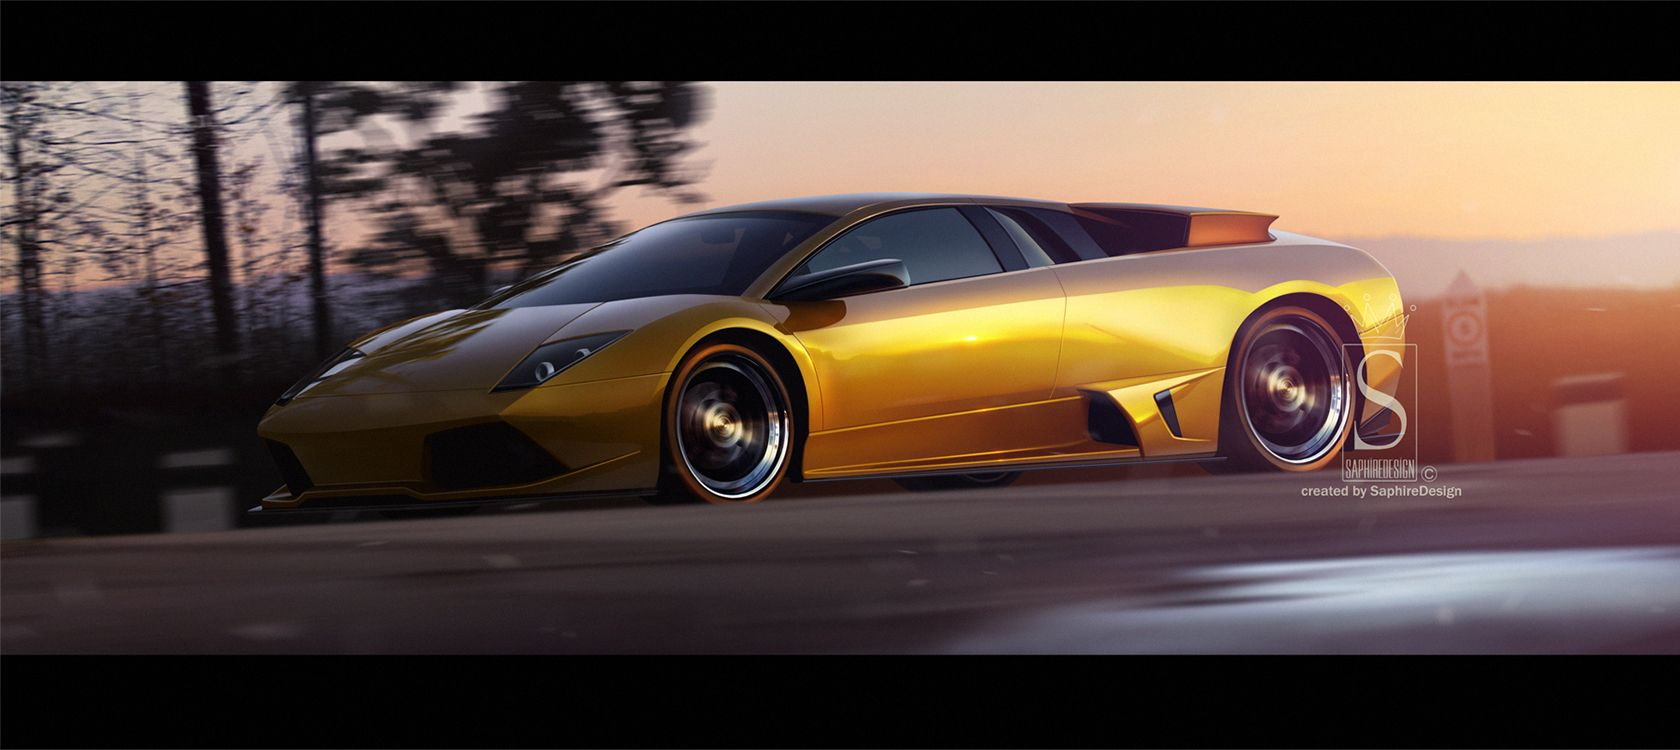 Lamborghini  murcielago LP640 by SaphireDesign.deviantart.com on @deviantART